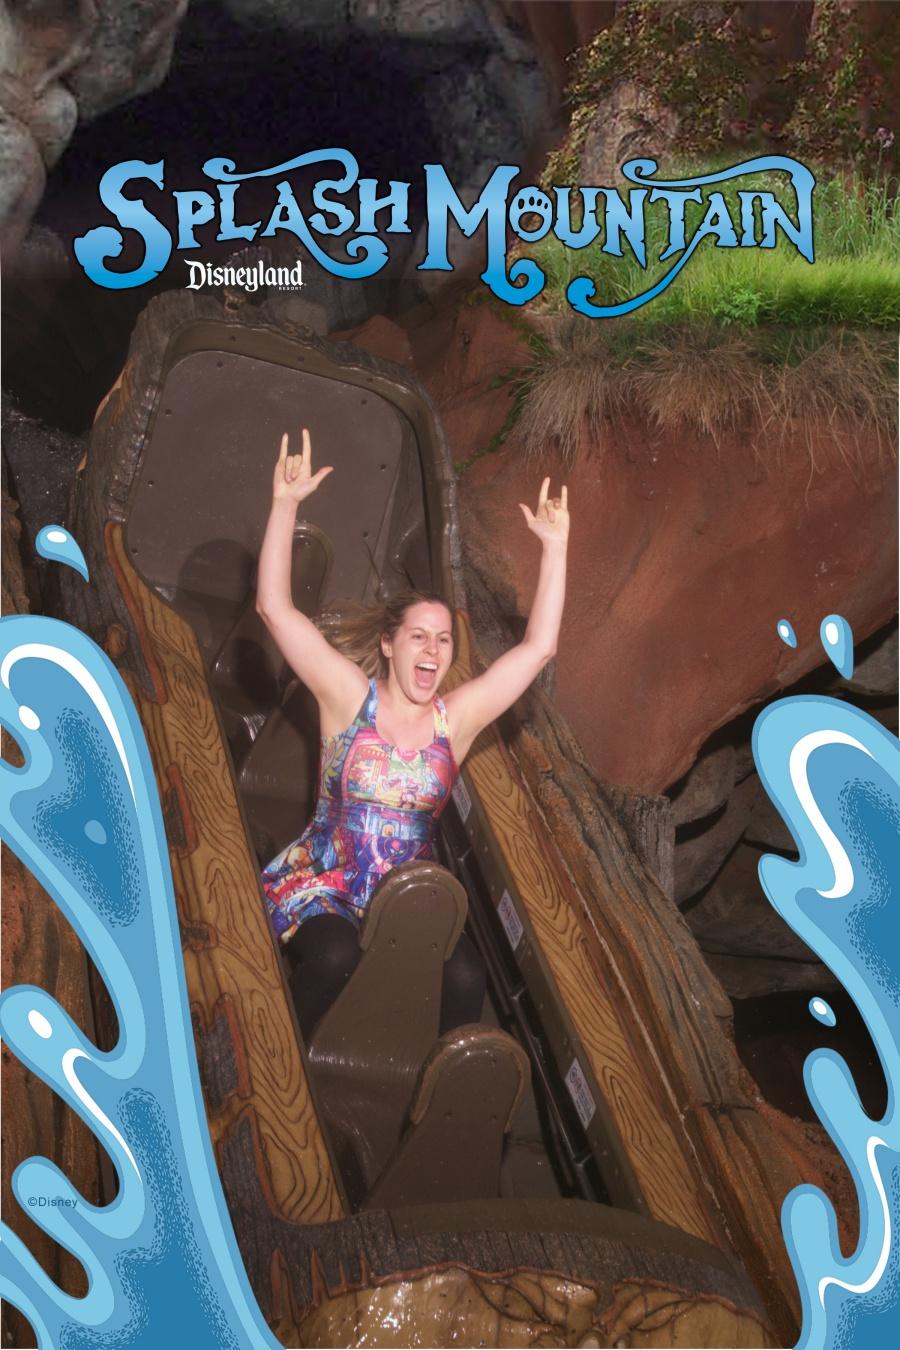 Girl riding Splash Mountain alone